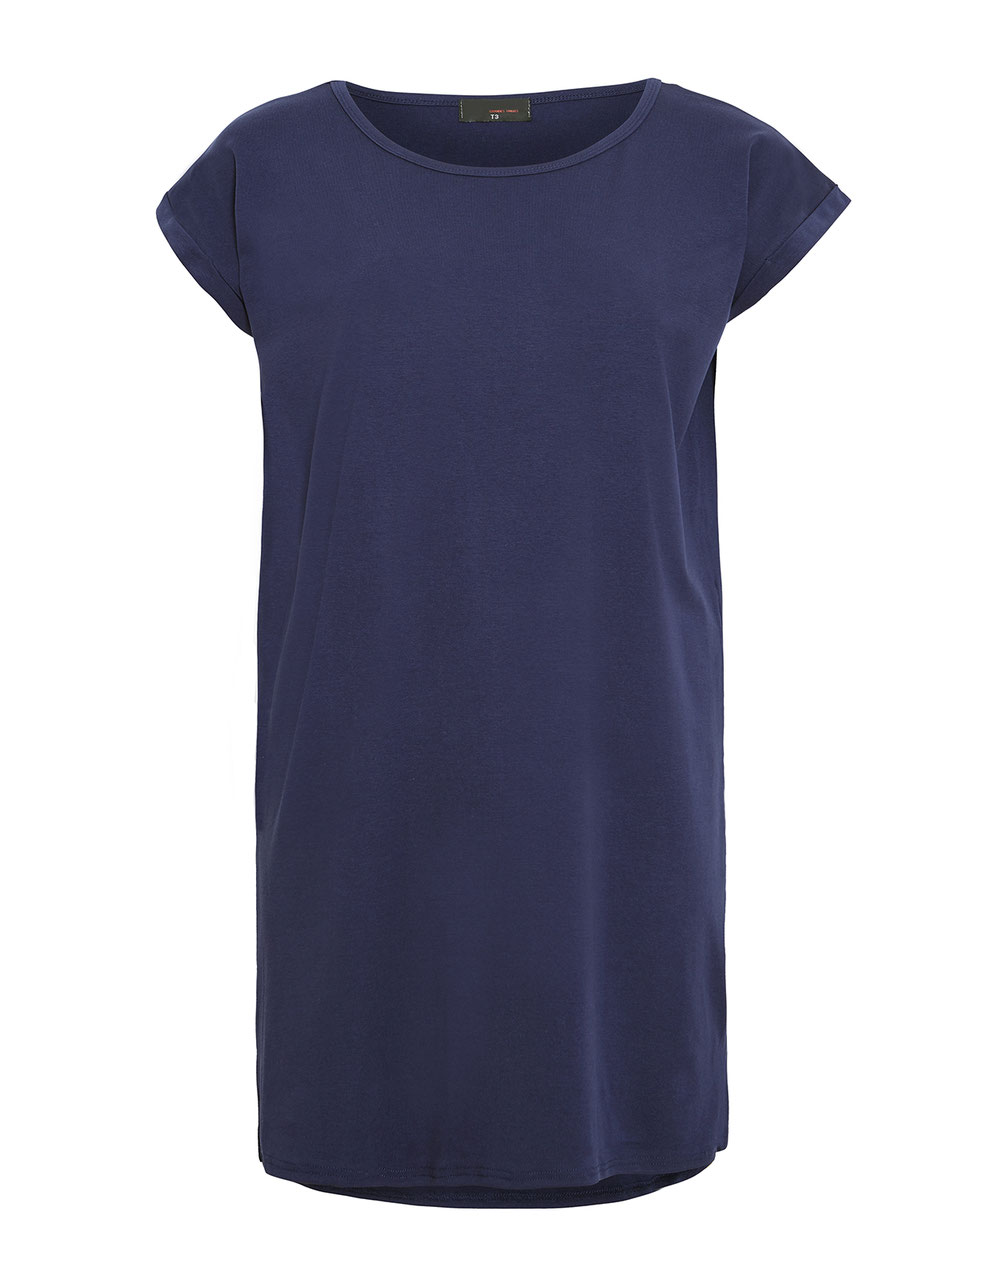 new arrival d1210 69e53 blaues T-Shirtkleid